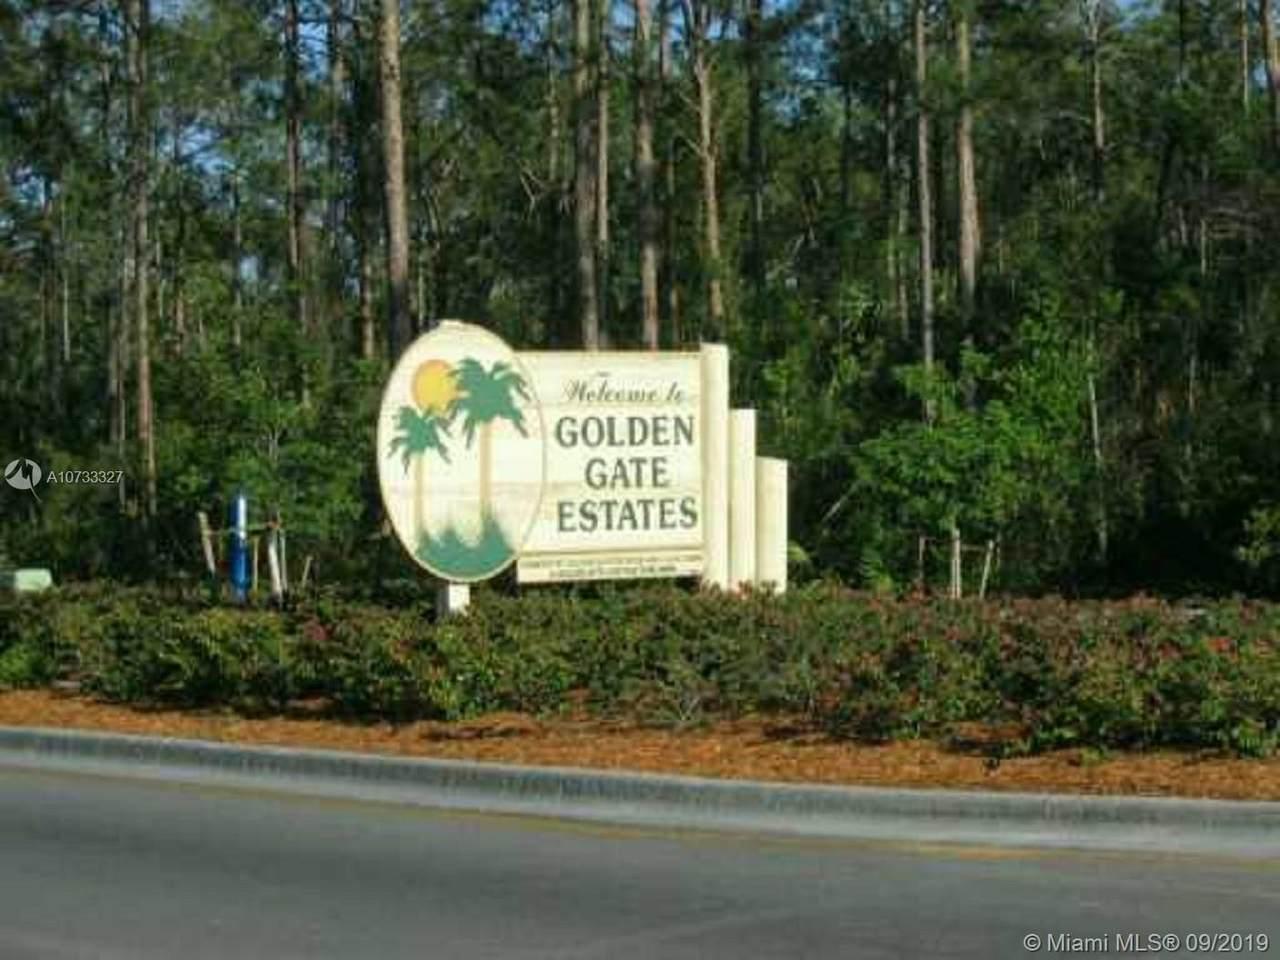 GOLDEN GATE BLVD Unit 10 Tr 103 - Photo 1